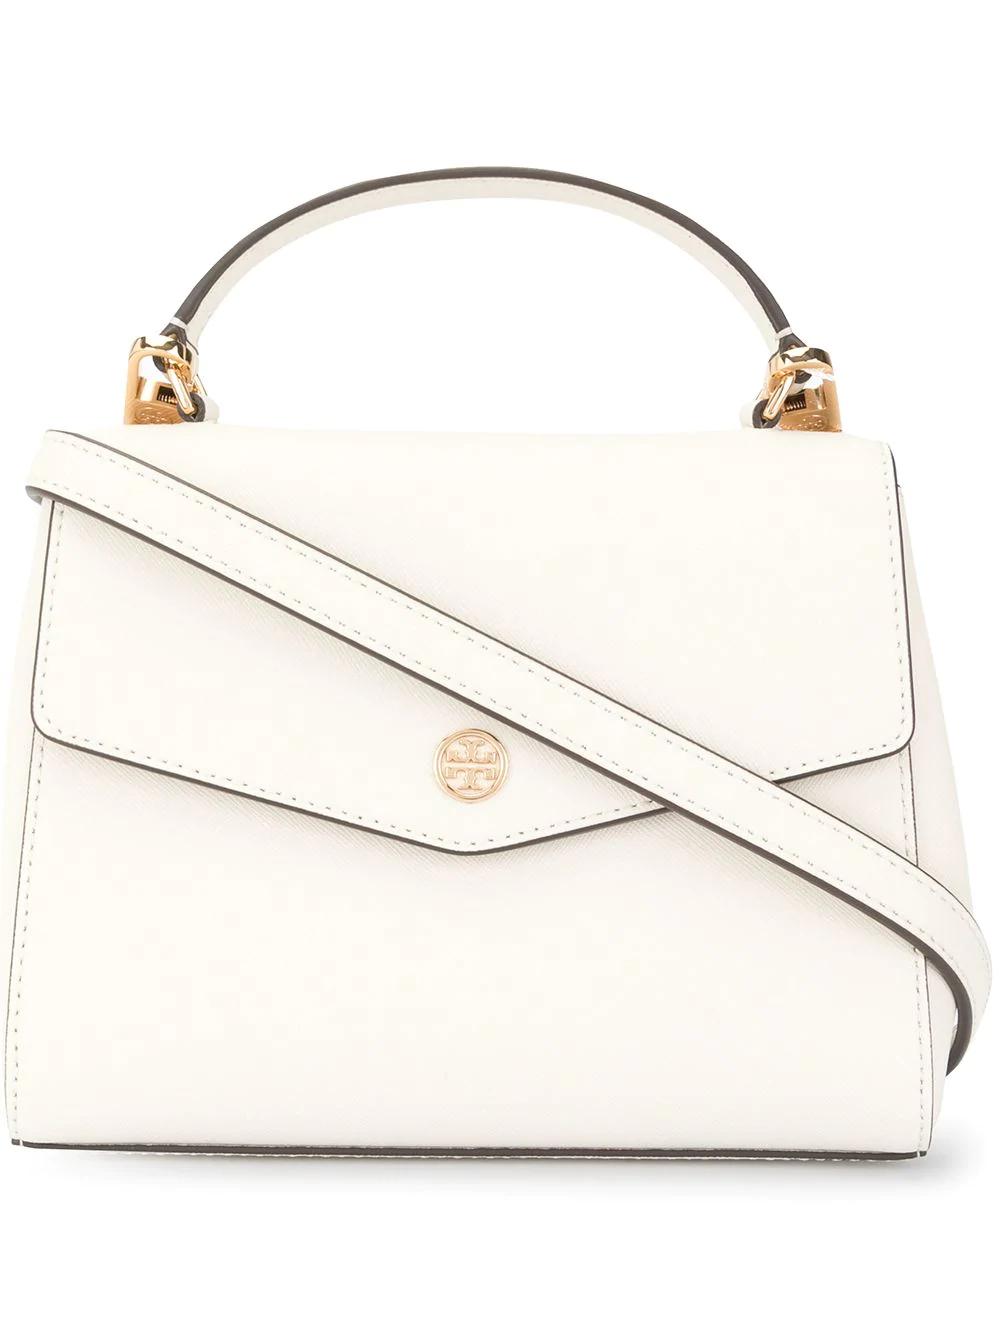 86f1f1dcaa0 Tory Burch Robinson Small Saffiano Top Handle Bag - White